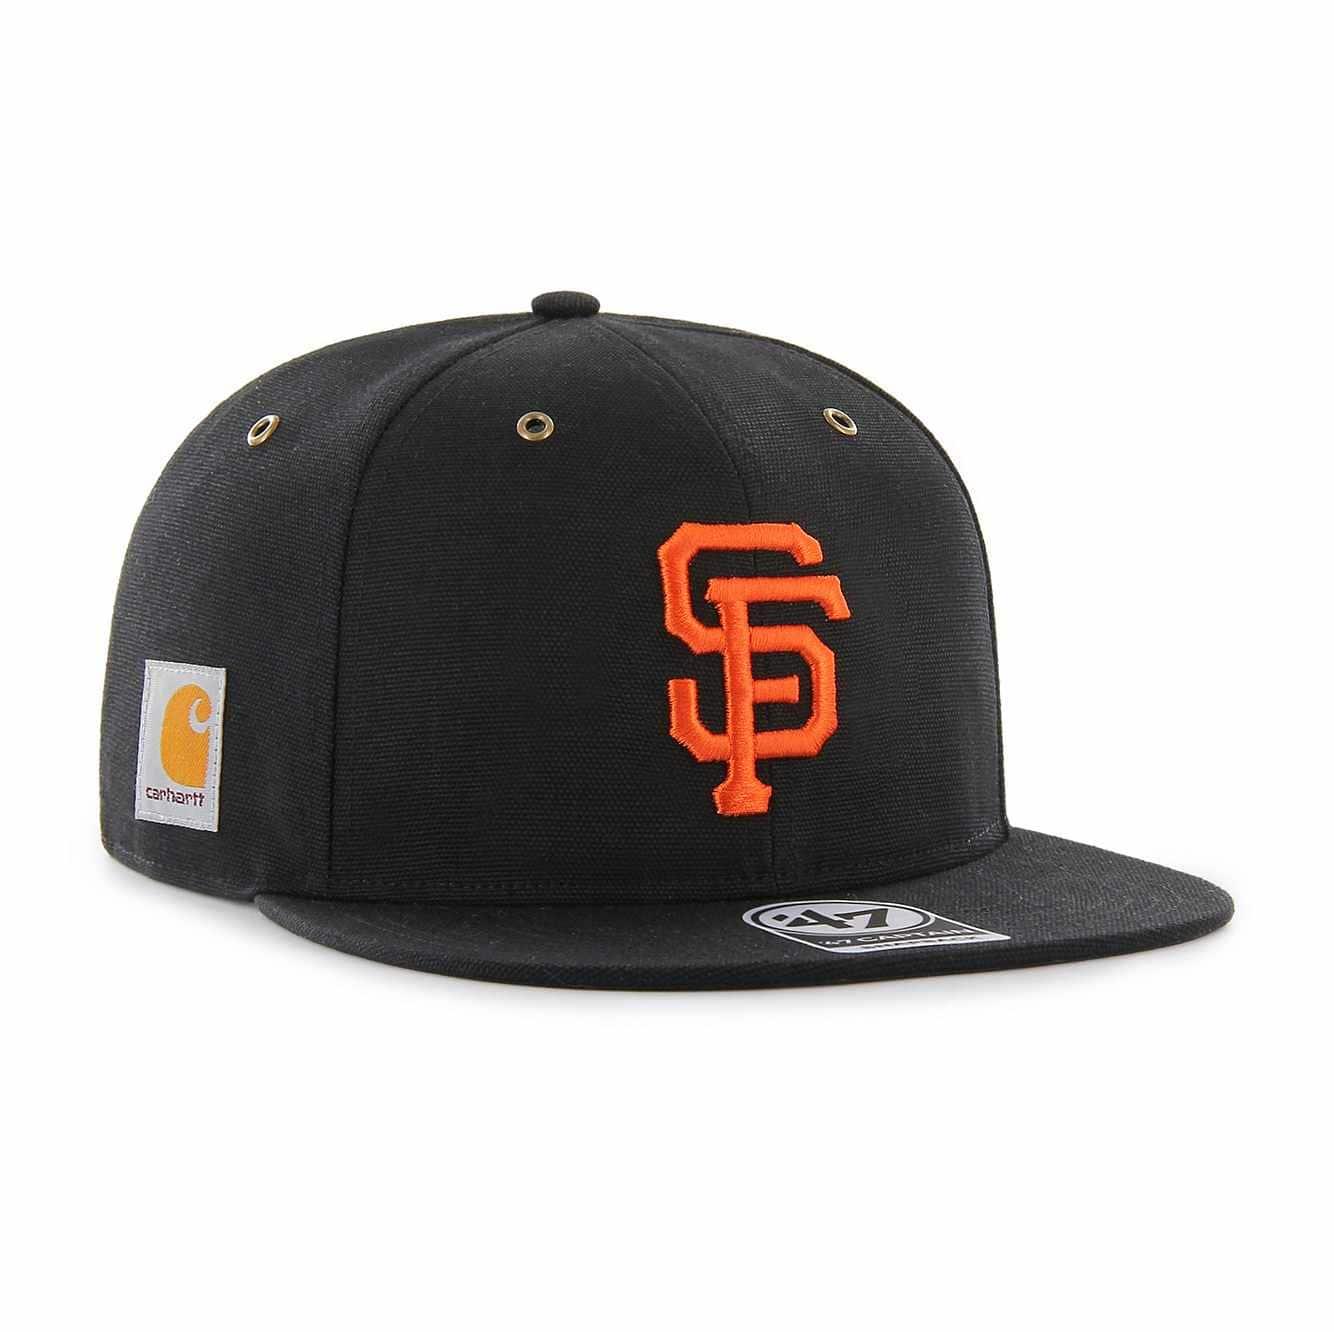 98ec3075c9b822 Men's San Francisco Giants Carhartt x '47 Captain KMORE122 | Carhartt